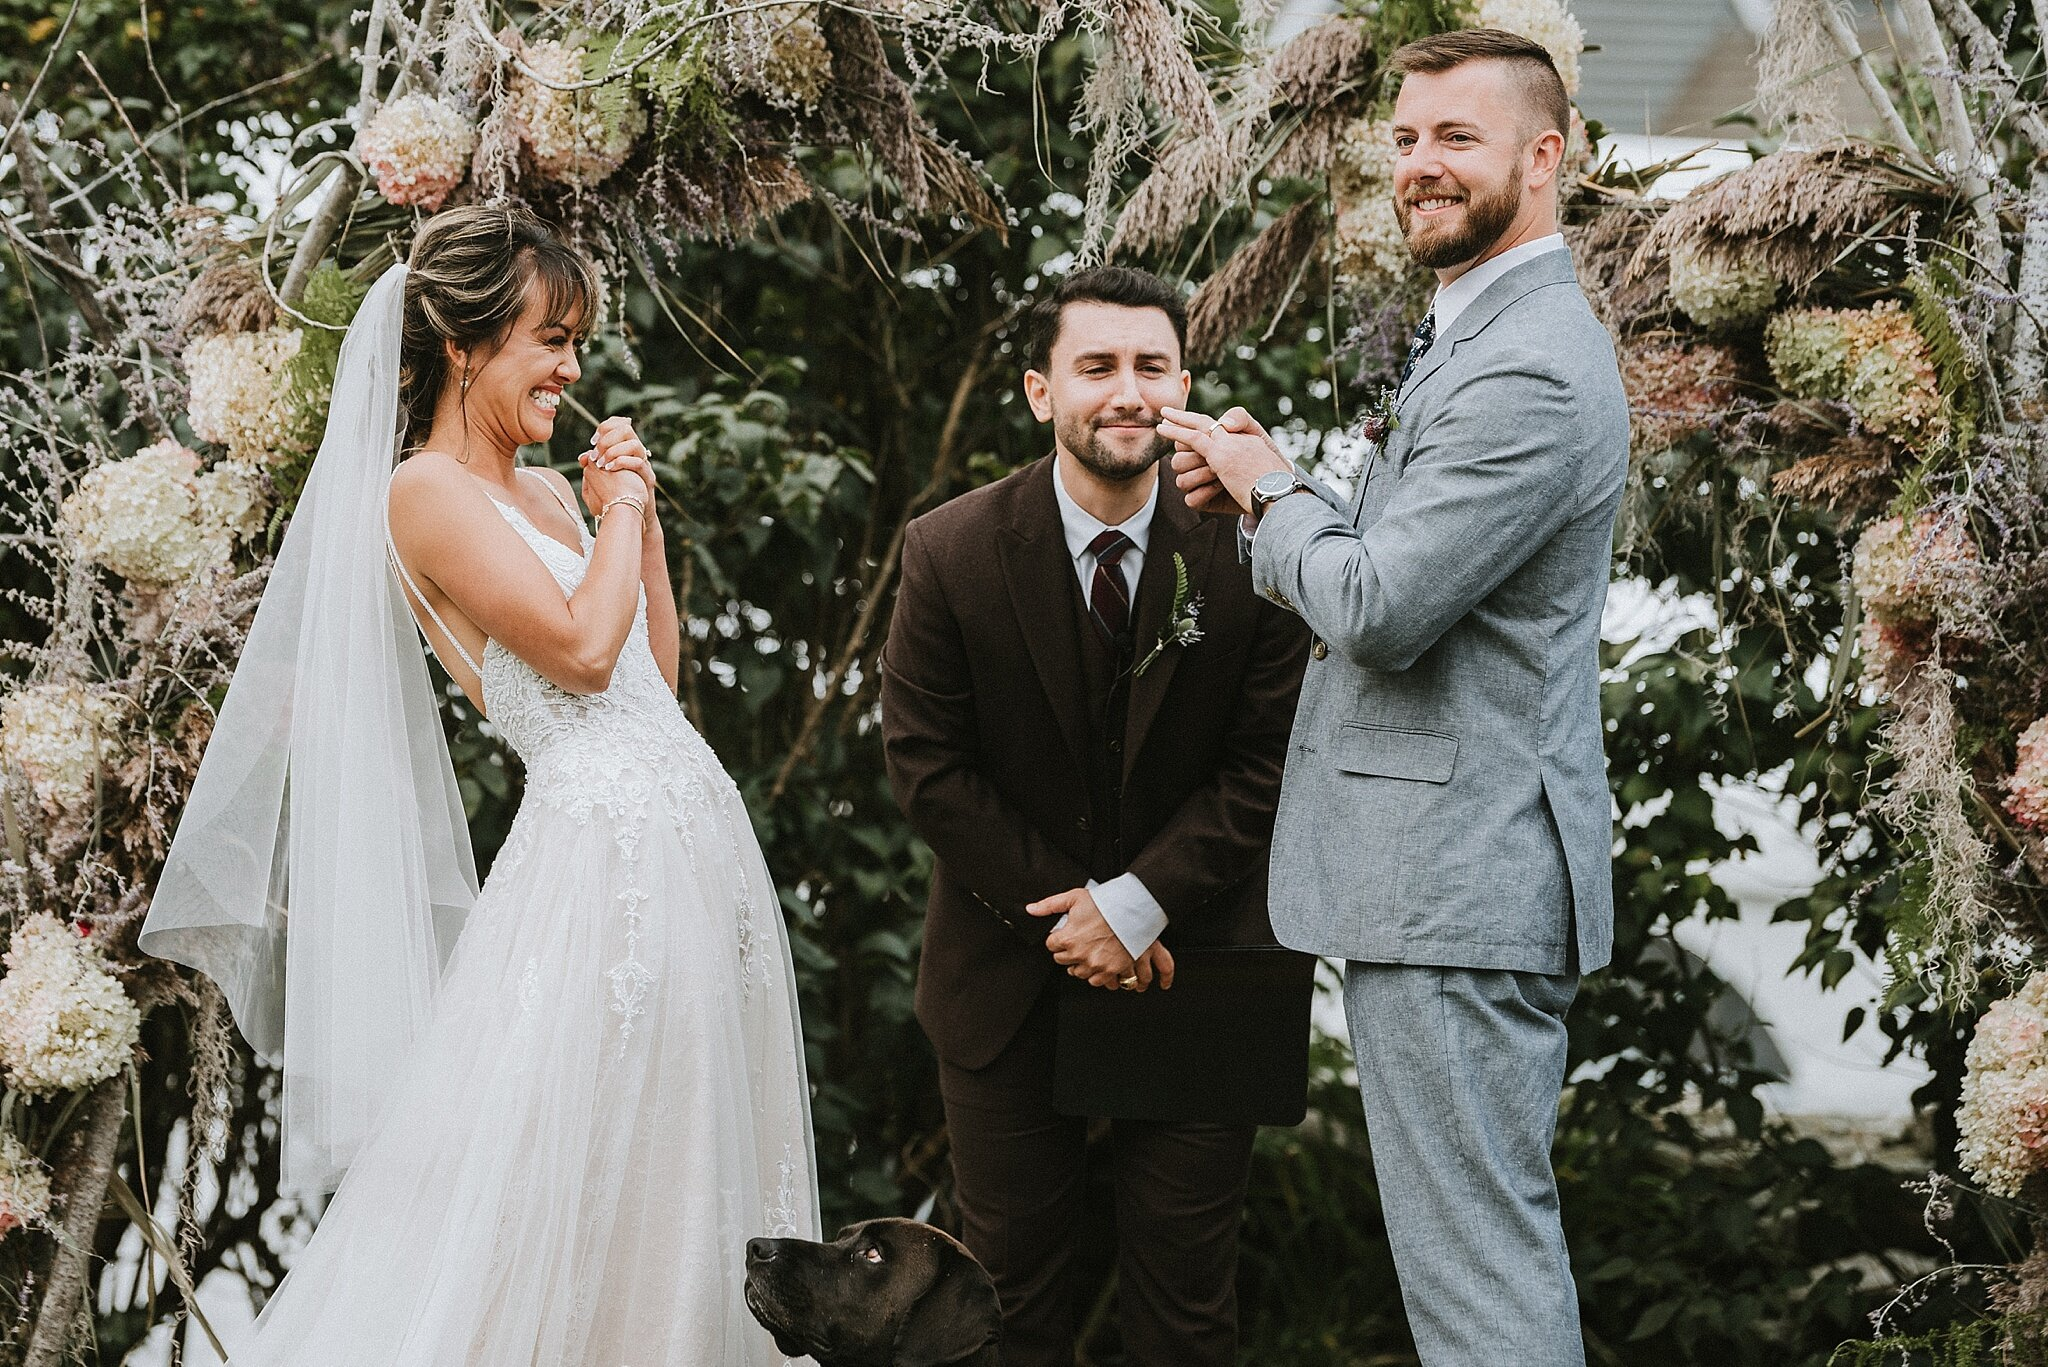 connecticut_wedding_3068.jpg